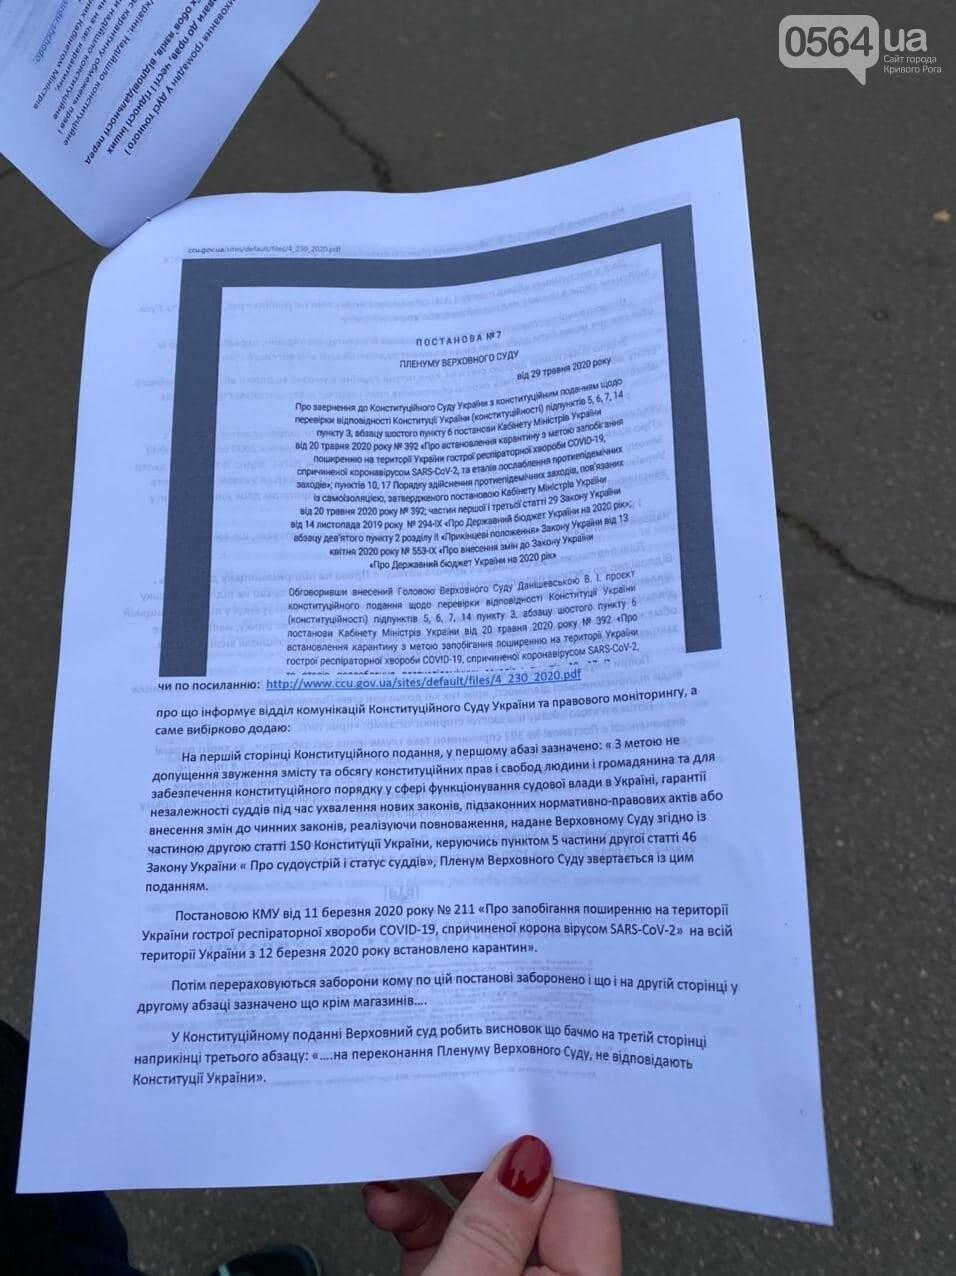 Представители малого бизнеса продолжили протест возле мэрии Кривого Рога, - ФОТО, ВИДЕО, фото-4